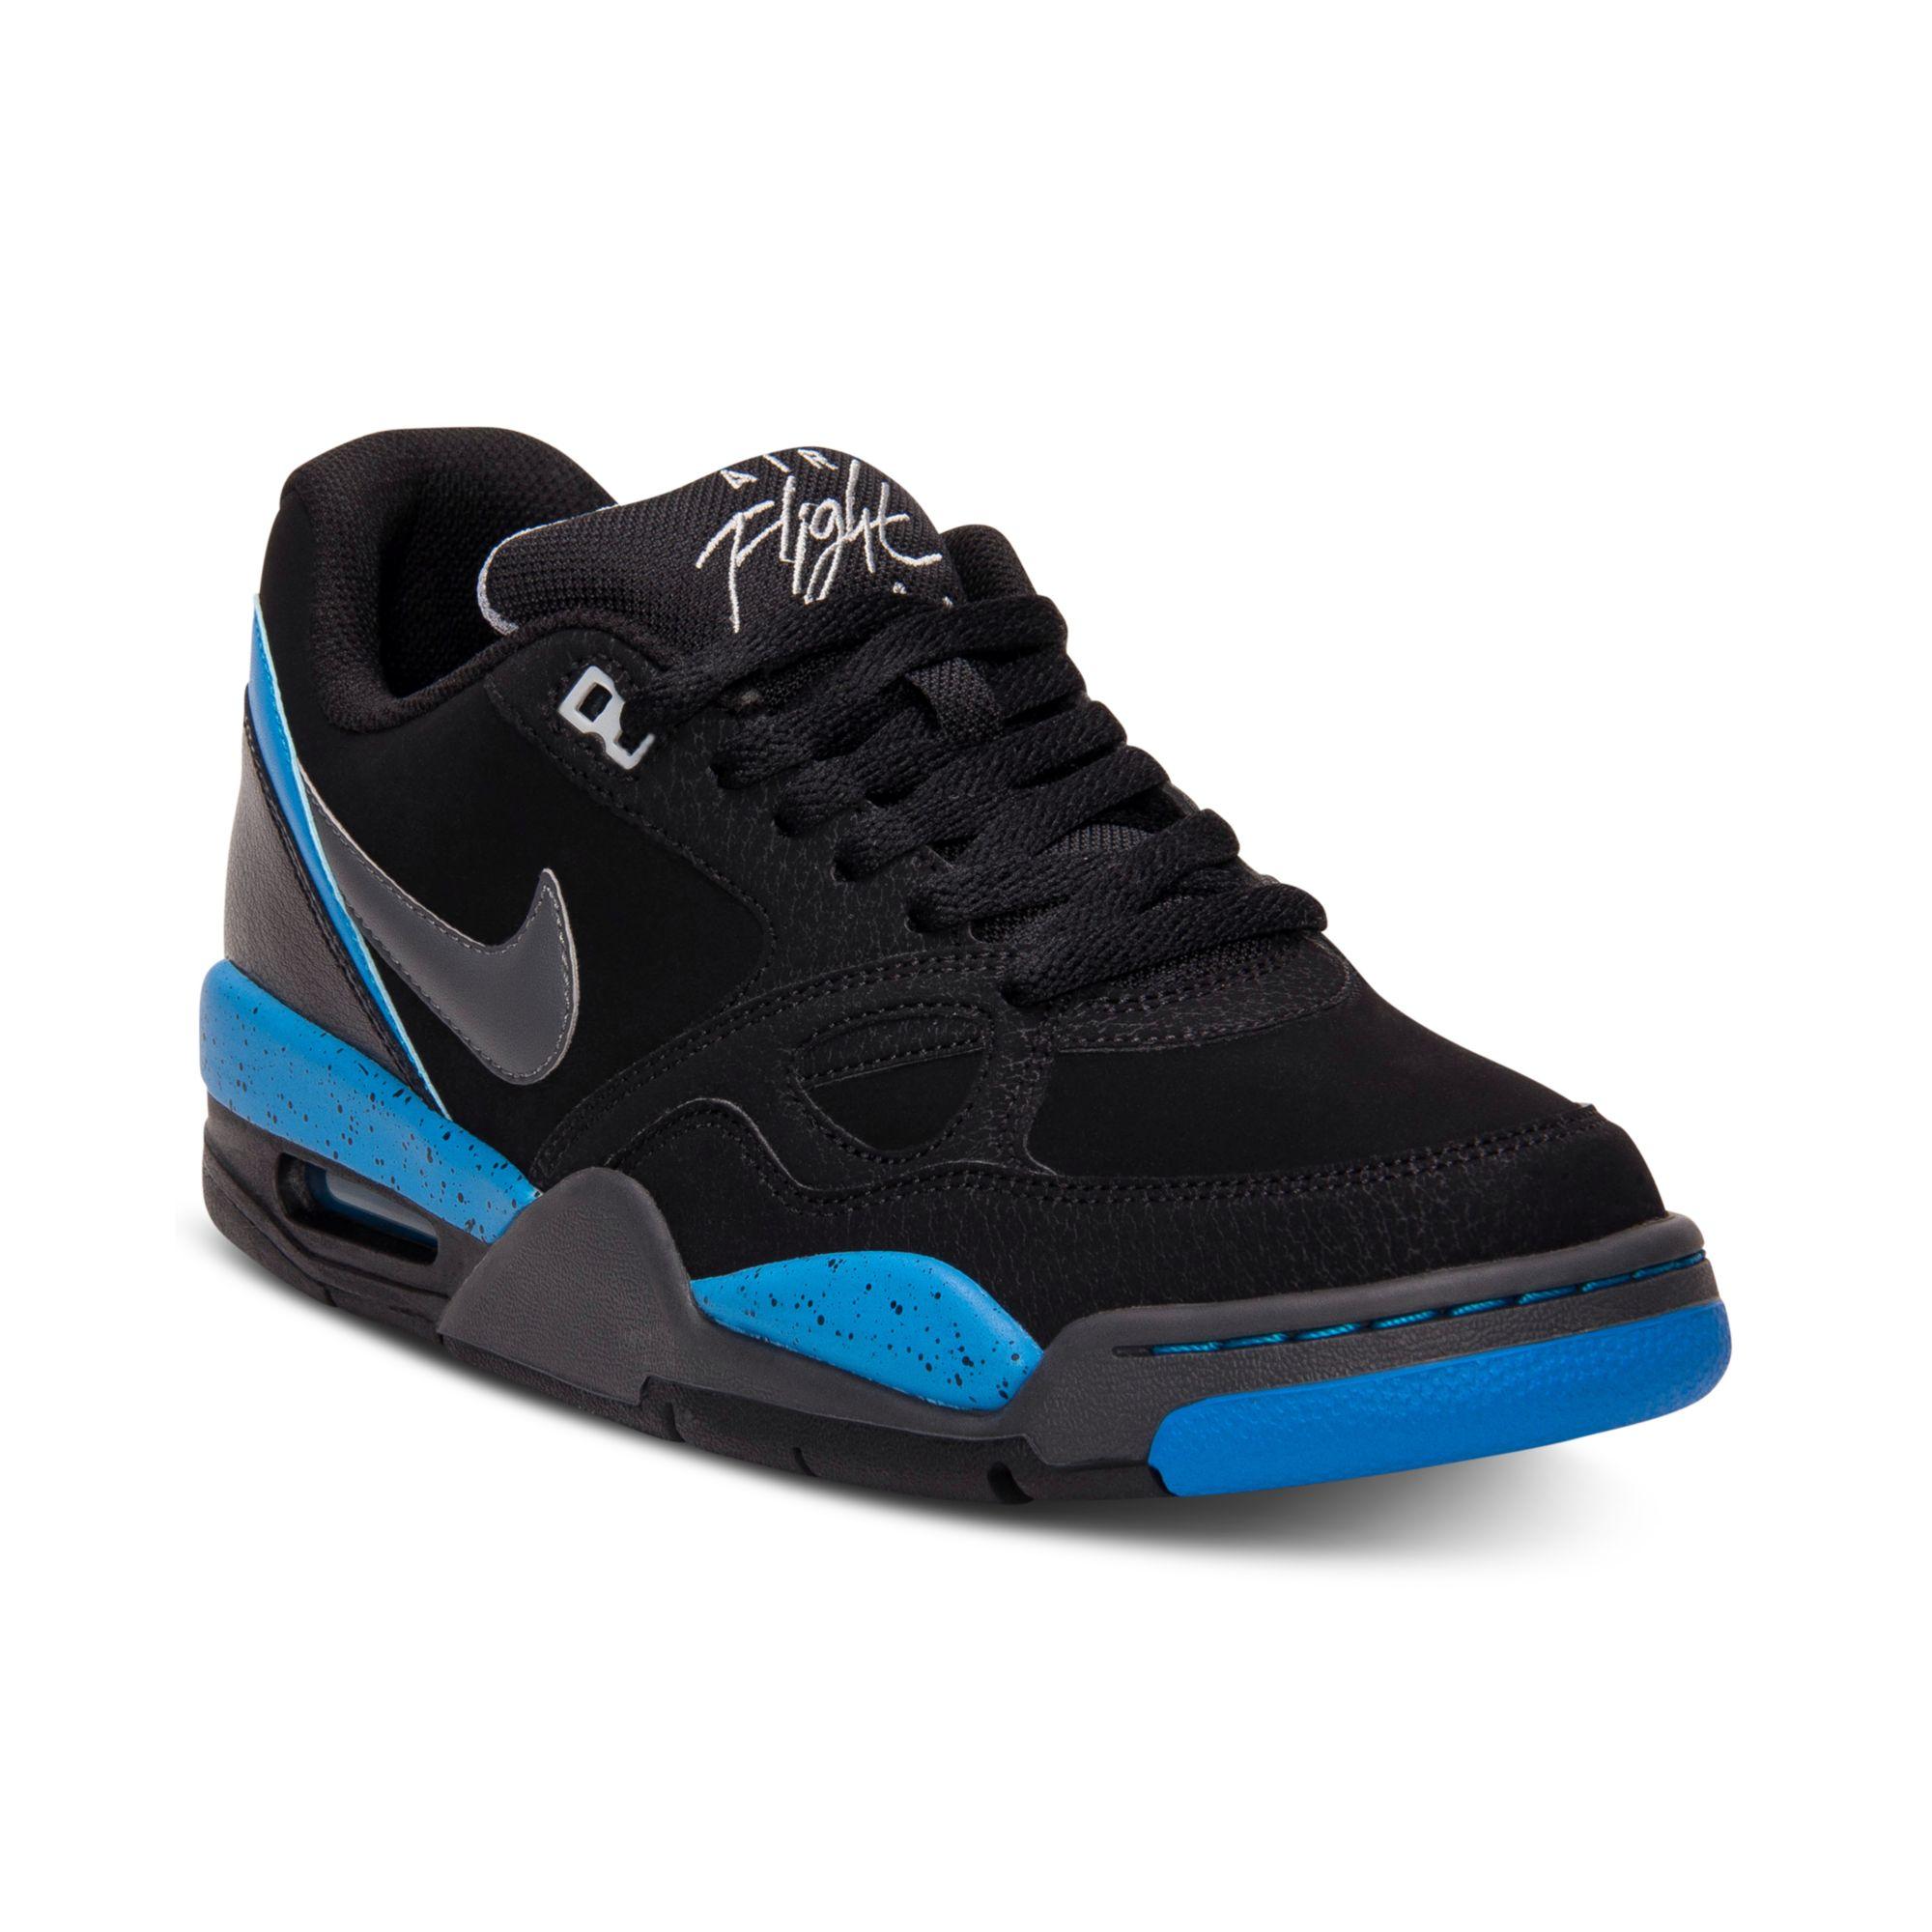 Nike Flight 13 Low Basketball Sneakers